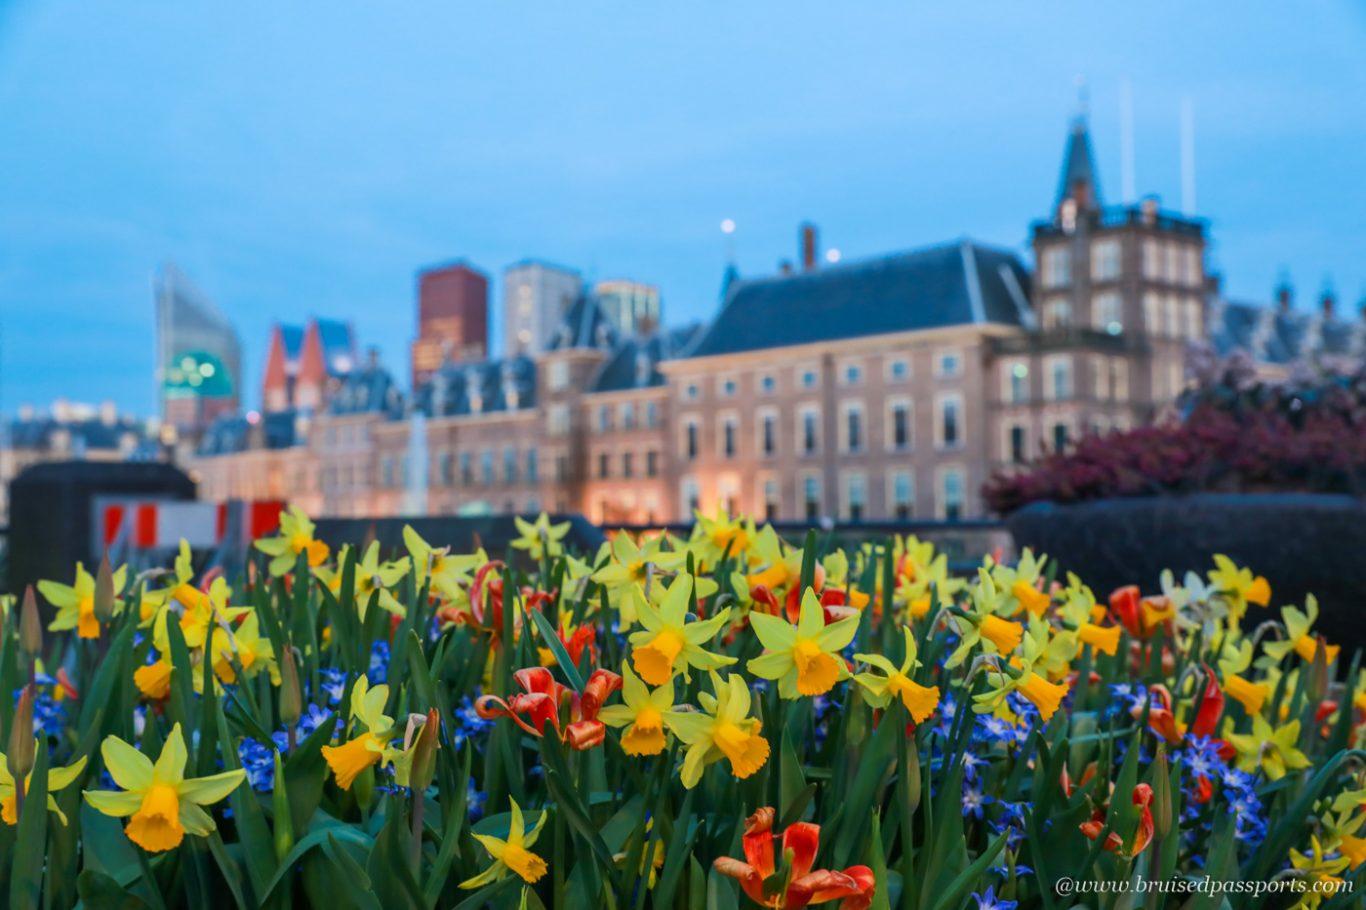 Hague tulips in city centre